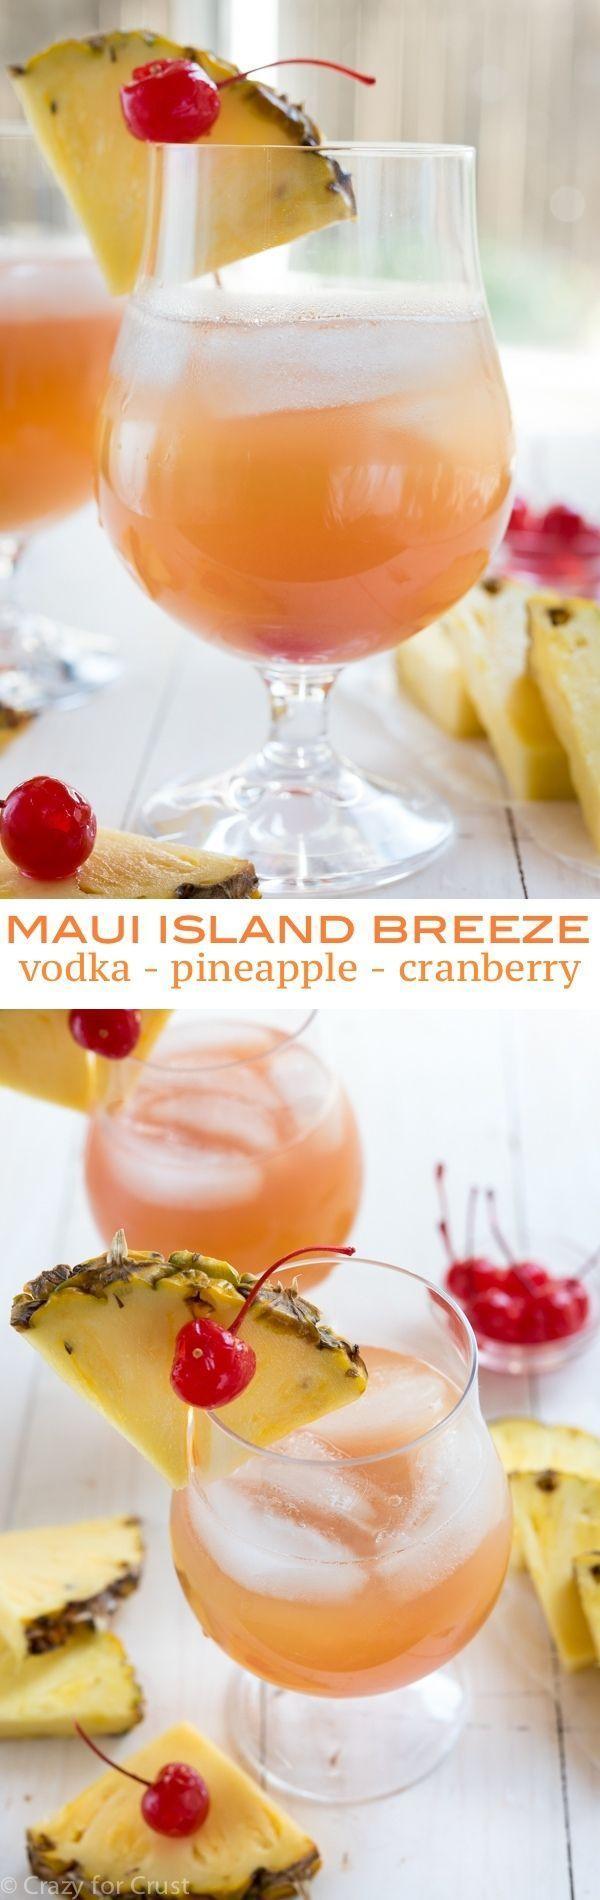 Hochzeit - Maui Island Breeze Cocktail